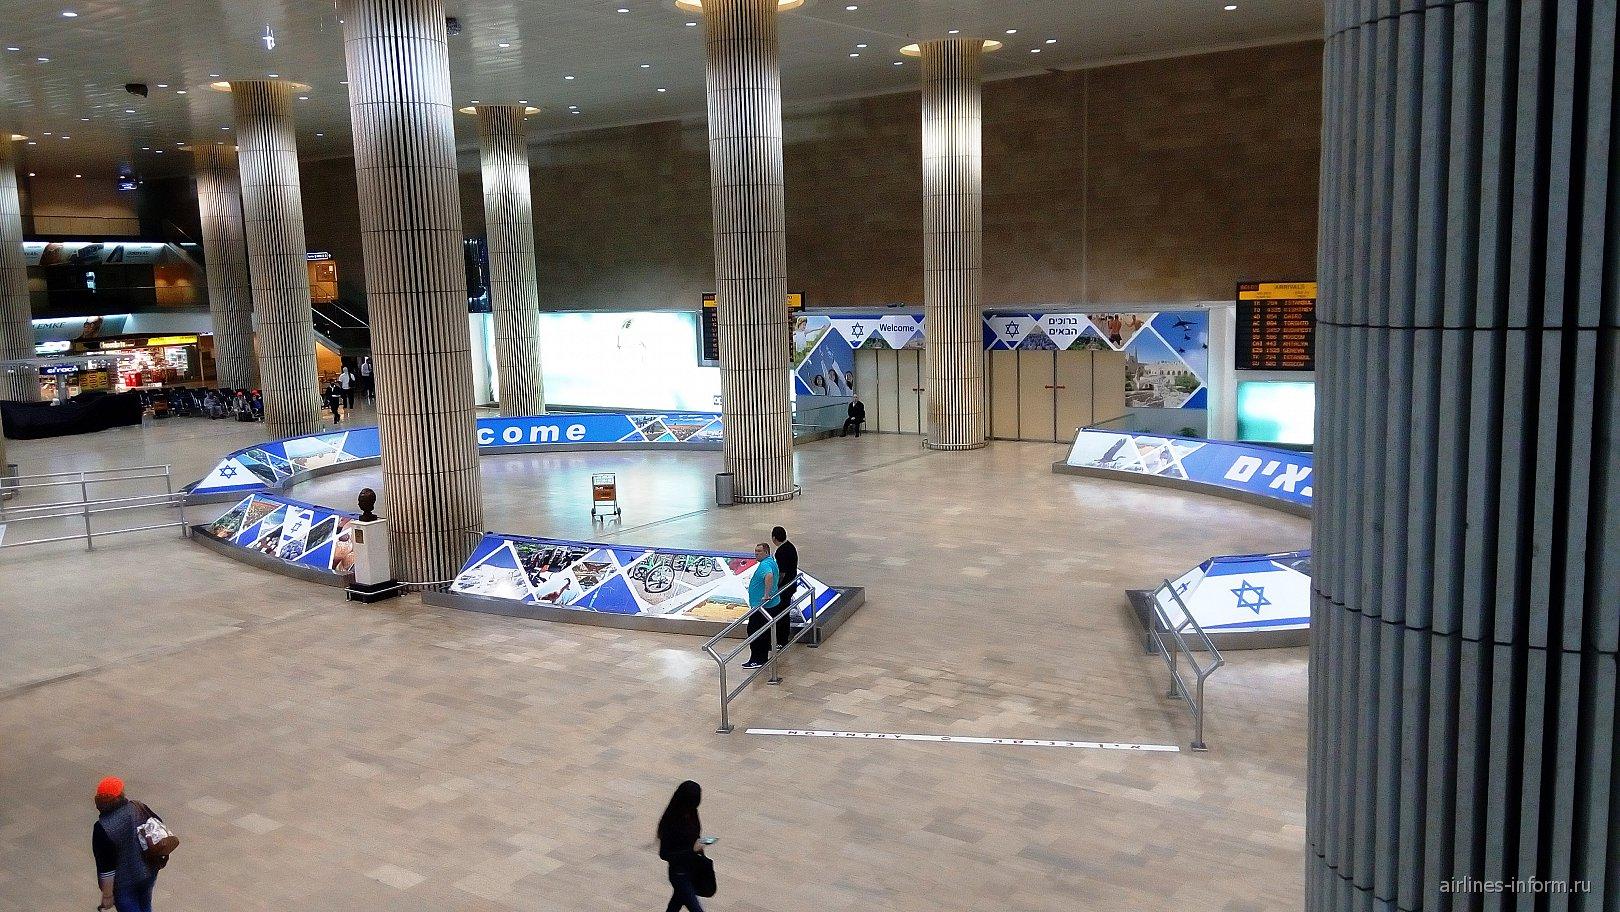 Зал прилета в аэропорту Тель-Авив Бен Гурион